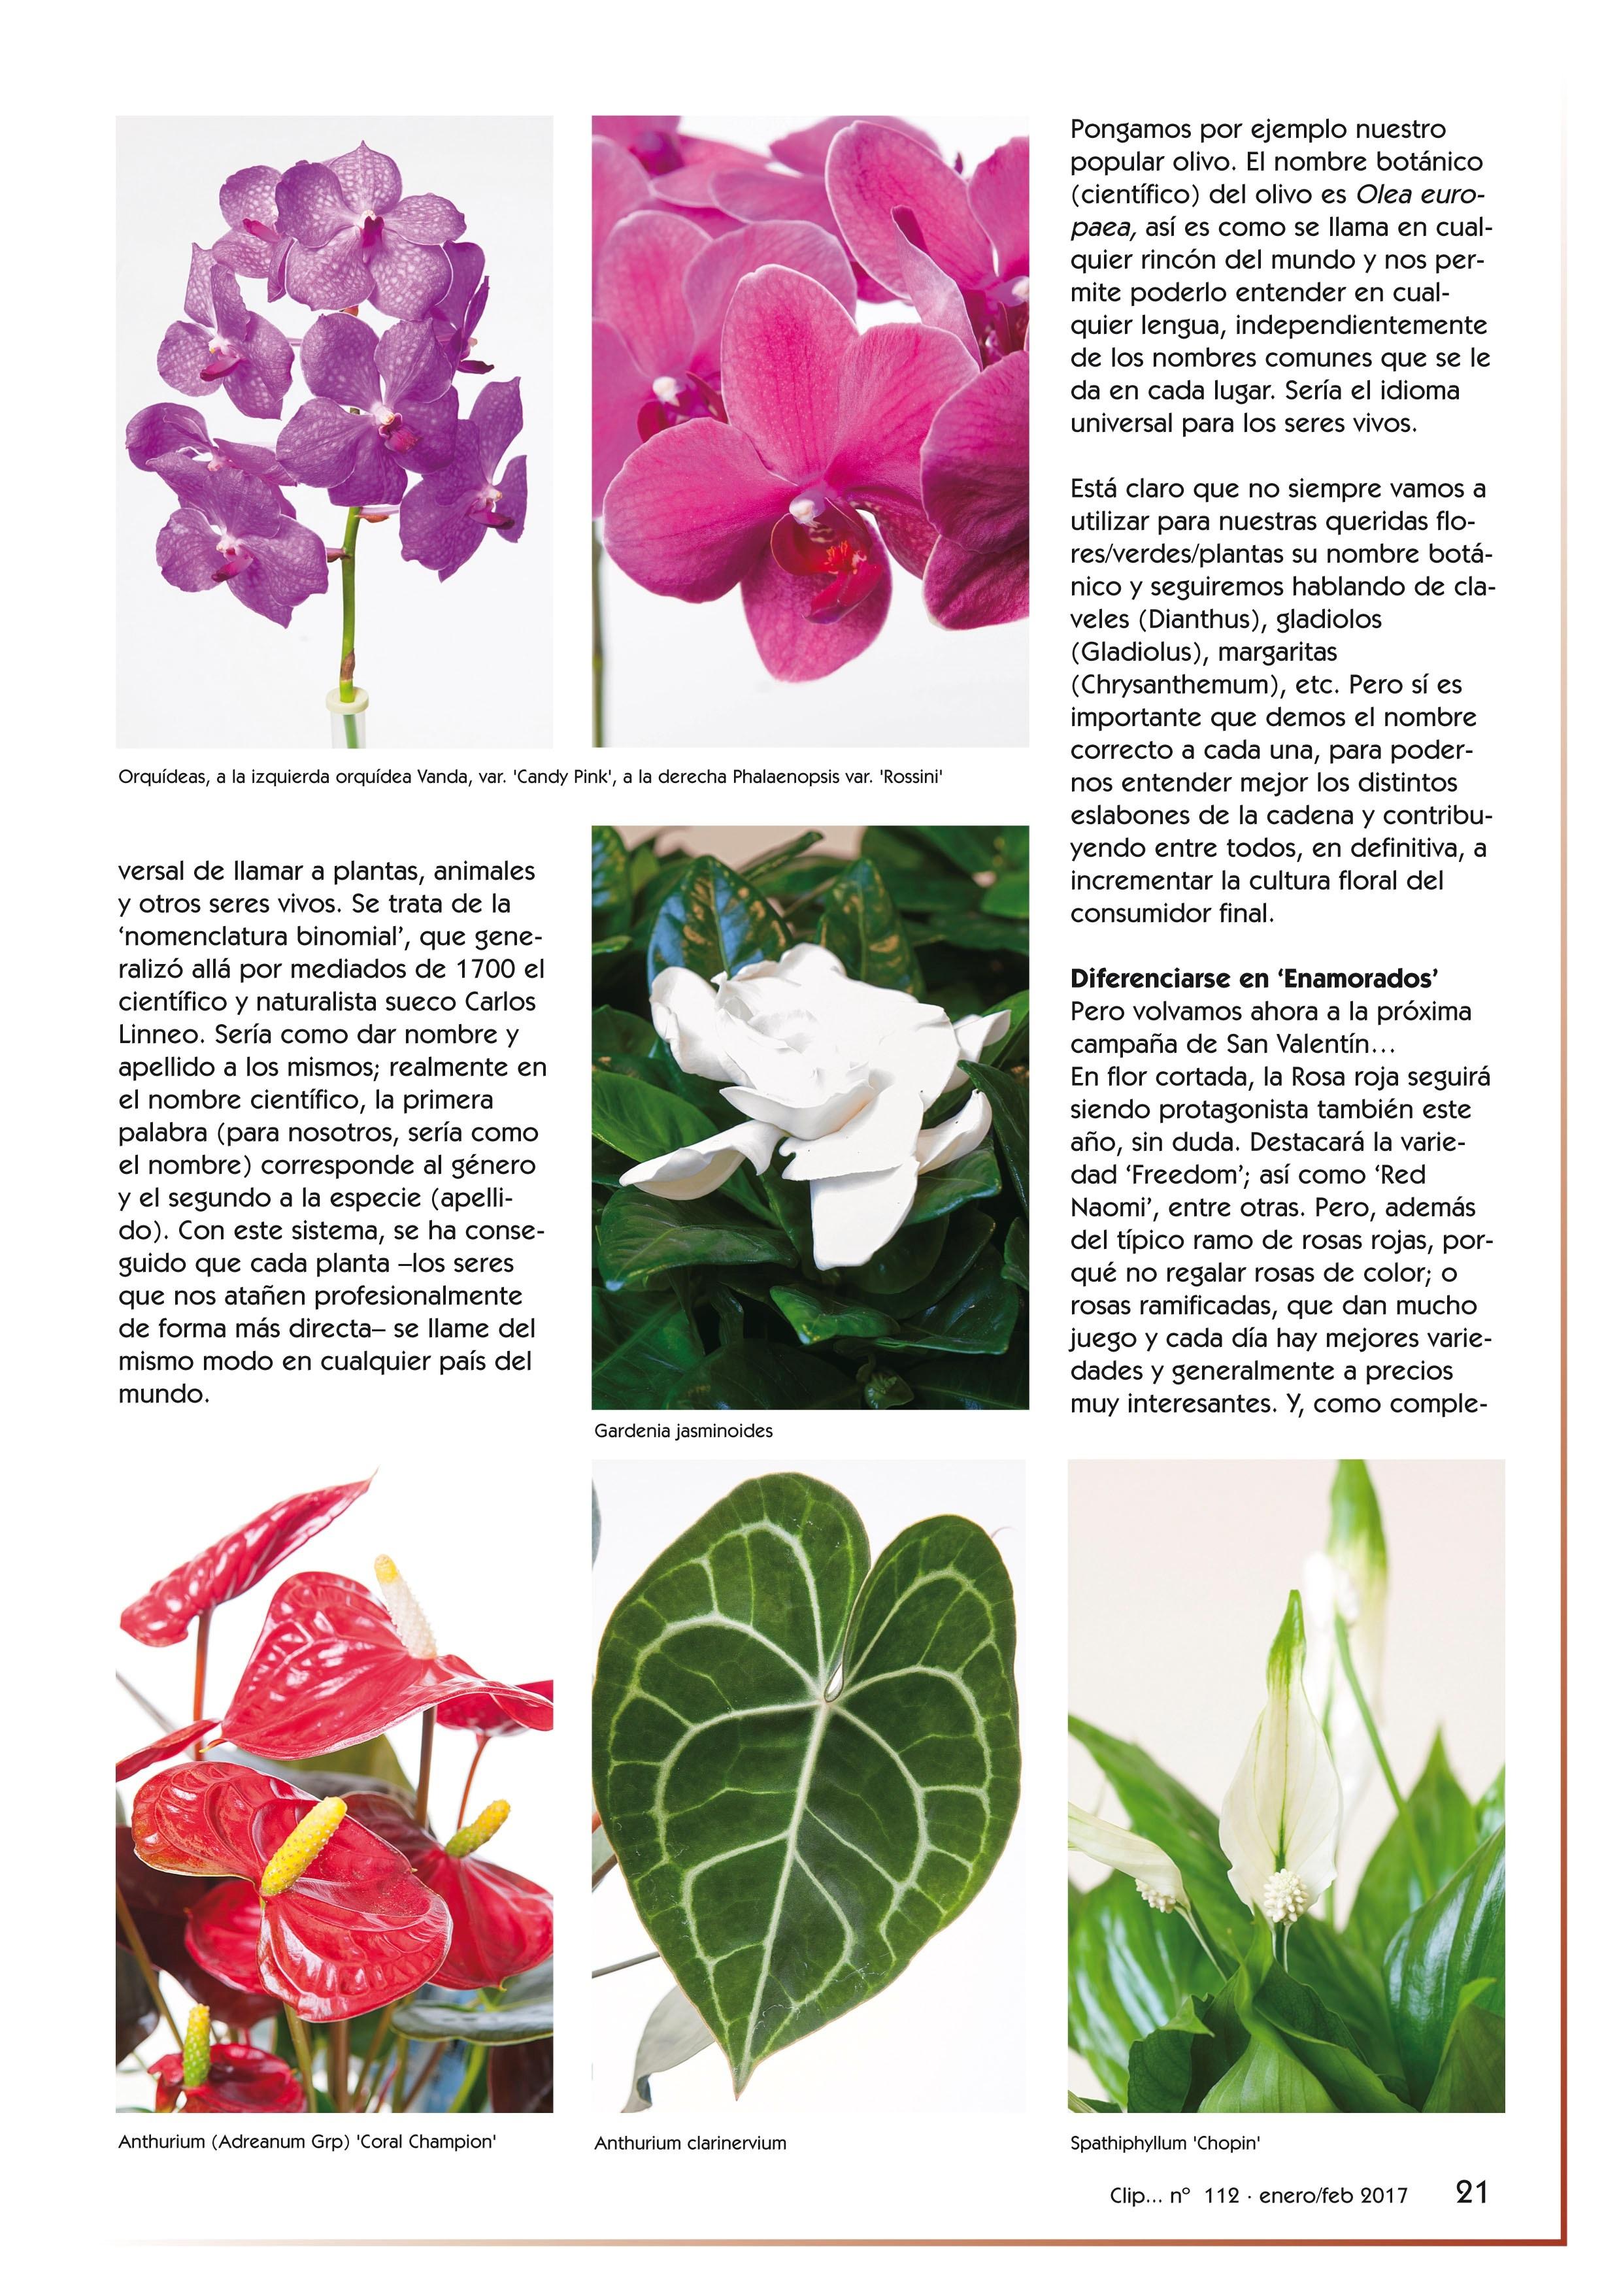 San Valentín ¿regalar flores o plantas? (clip nº 112, pág. 21)